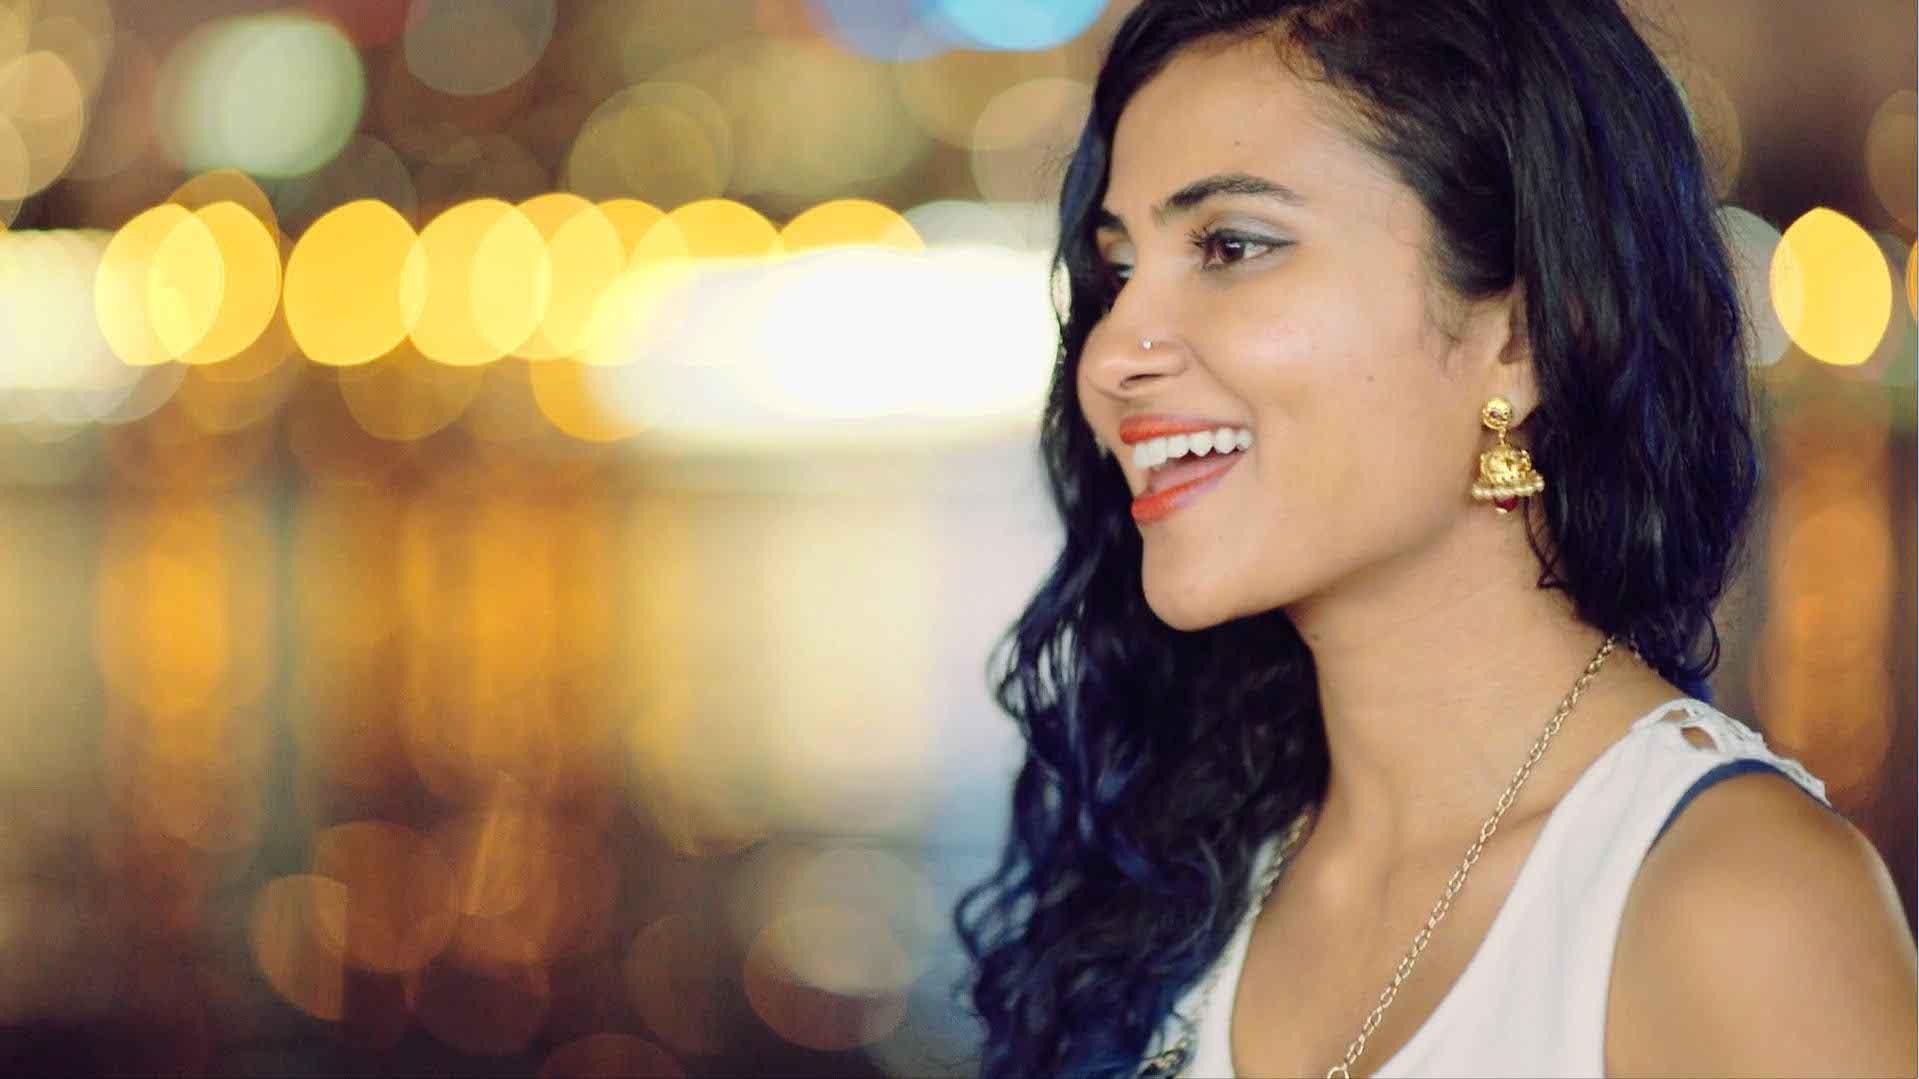 Vidya Vox Hot >> Pooja Hegde Biography - Age, DOB, Height, Weight, Awards, Movies, etc